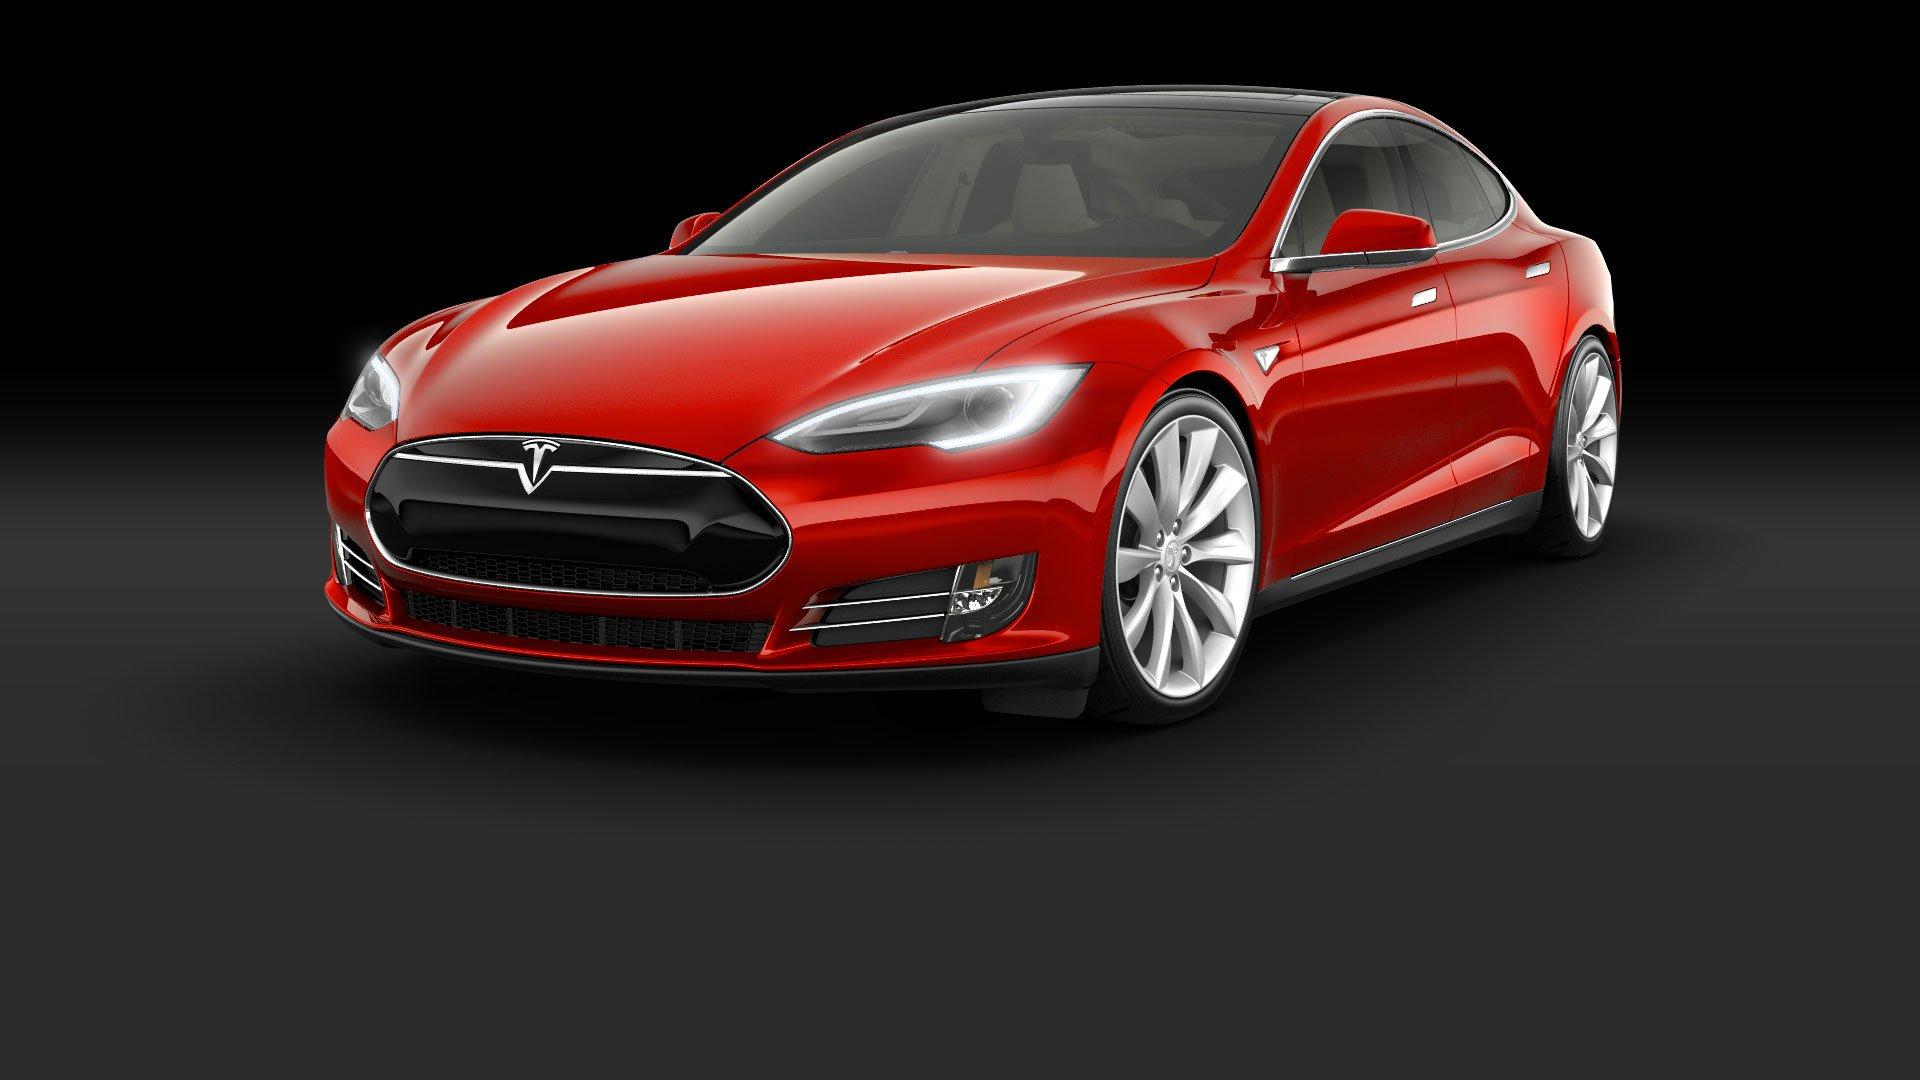 Tesla wallpaper image hd